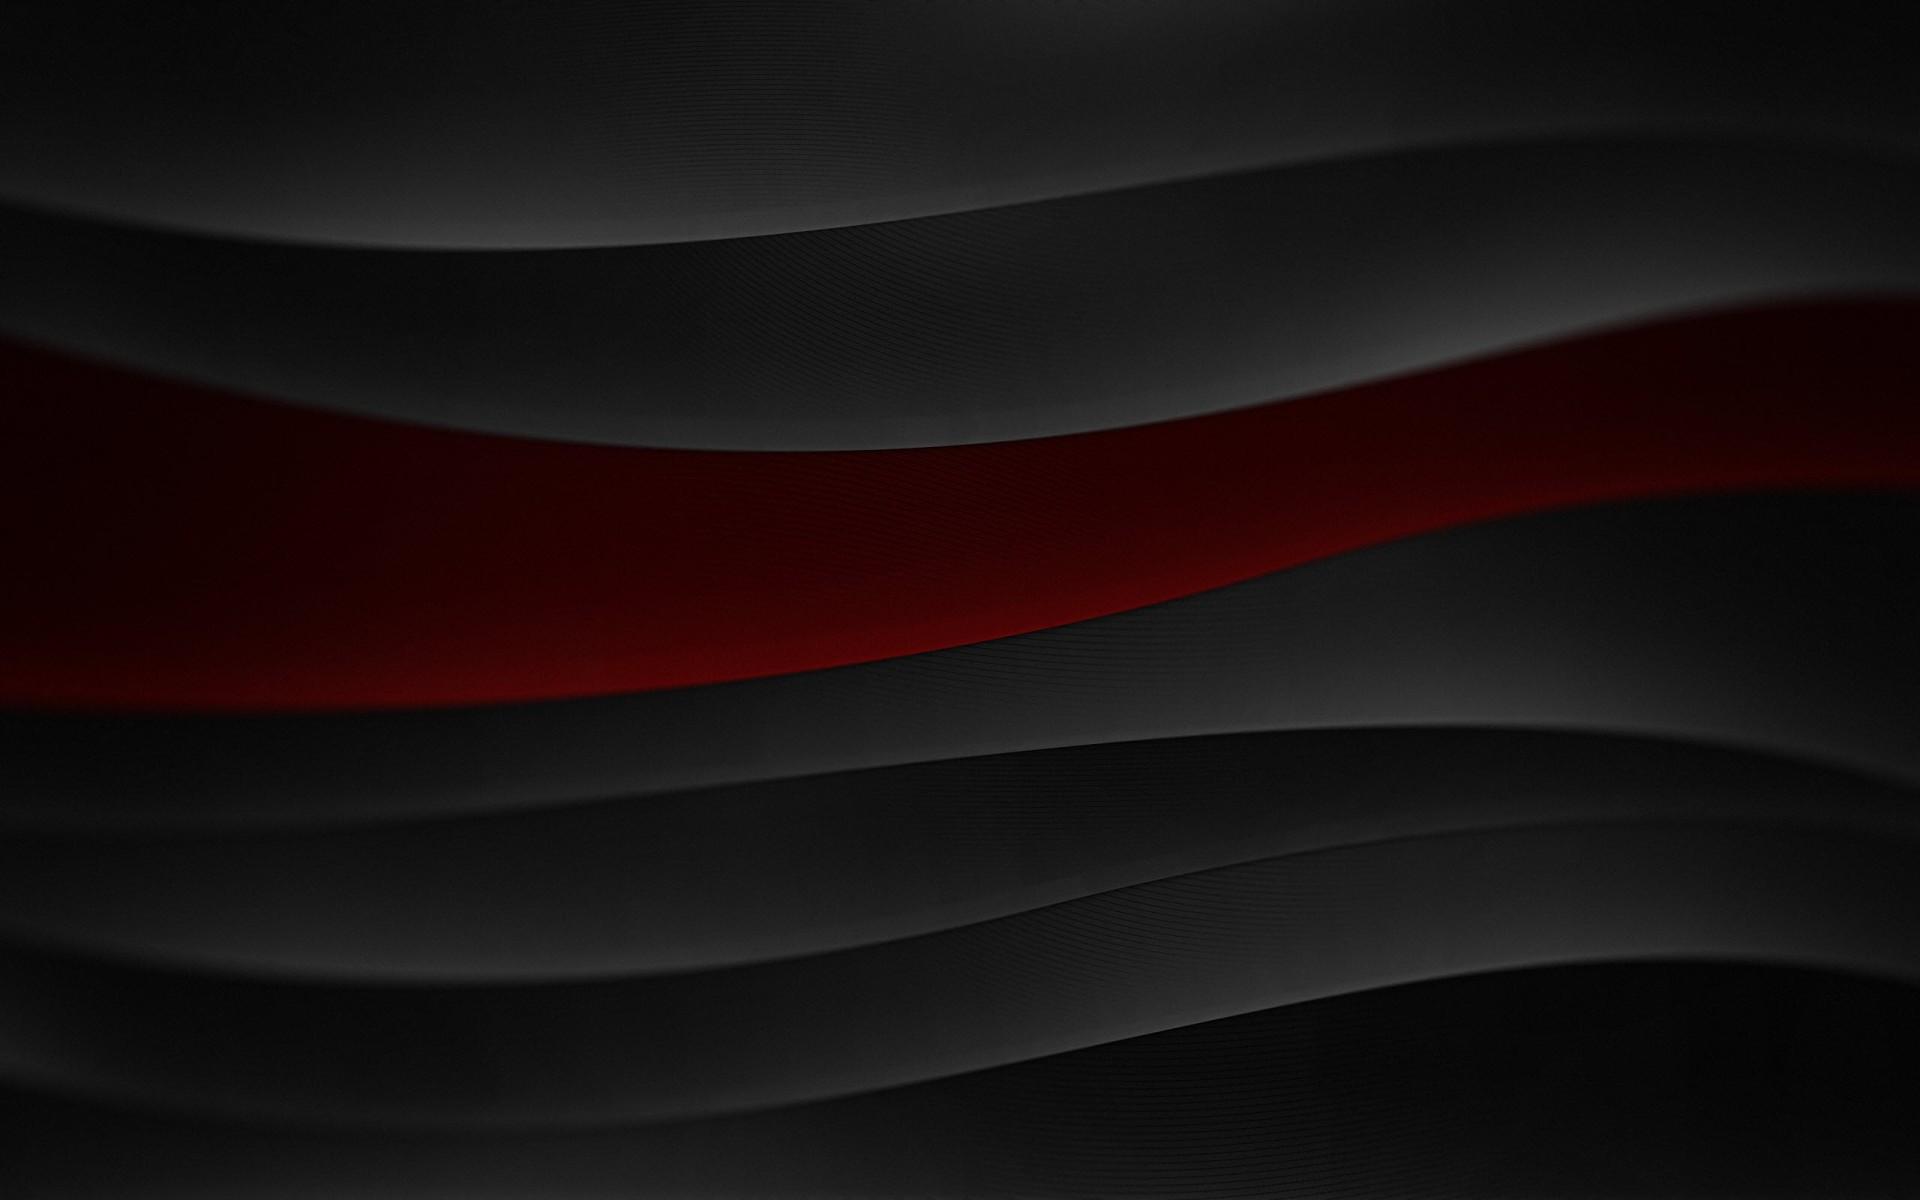 Abstract Wallpaper: Black Abstract Wallpaper Photo for Wallpaper